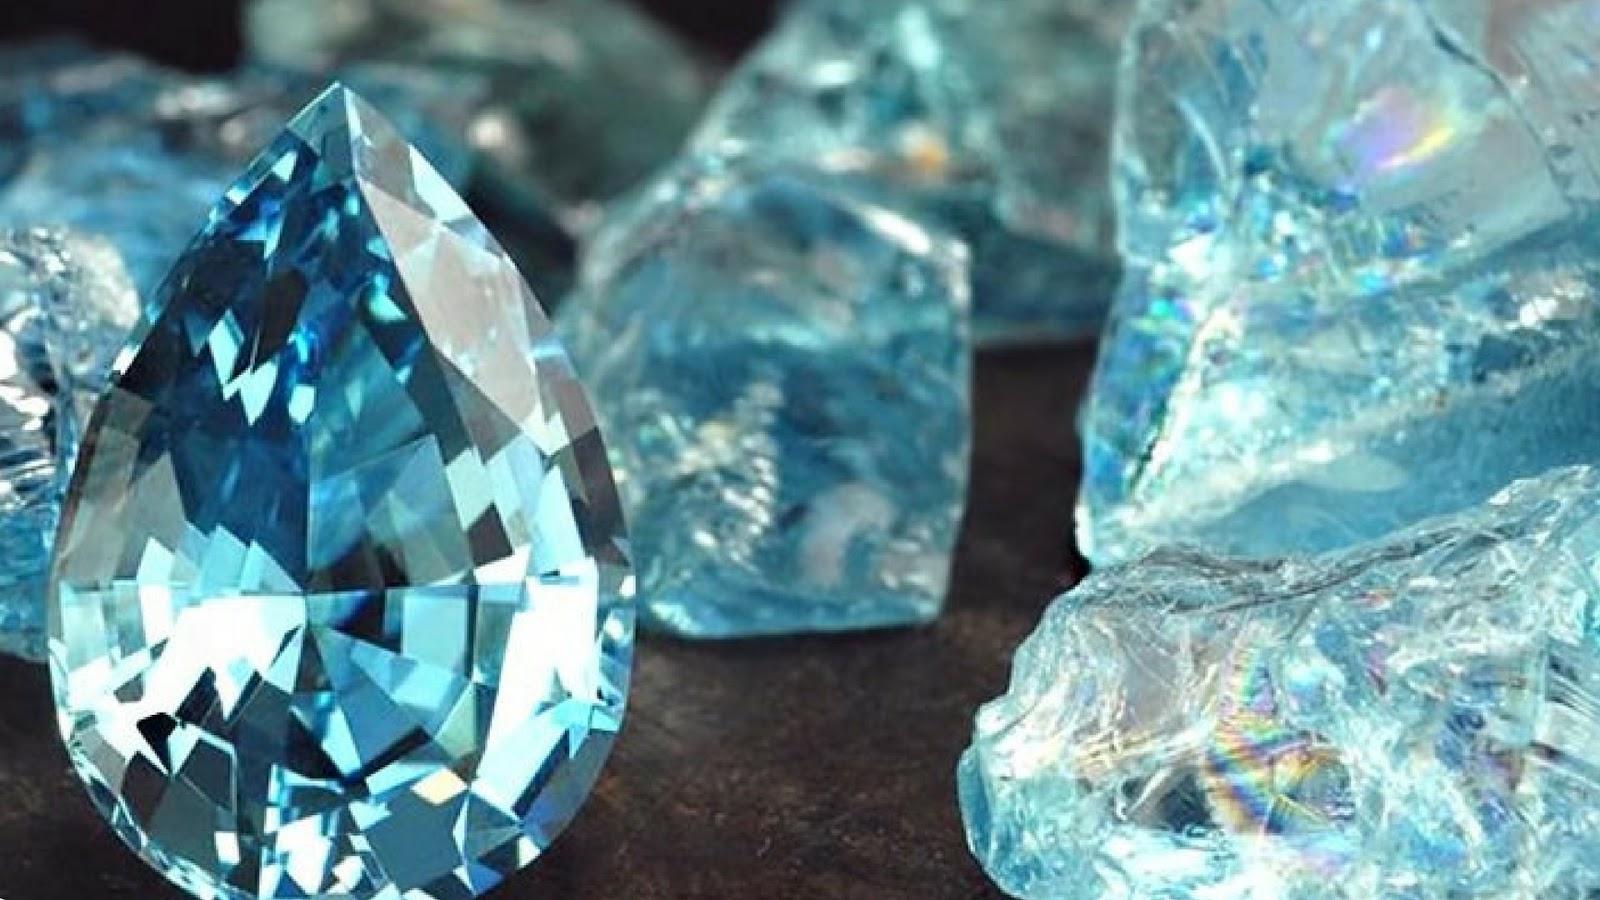 piedras preciosas aguamarina